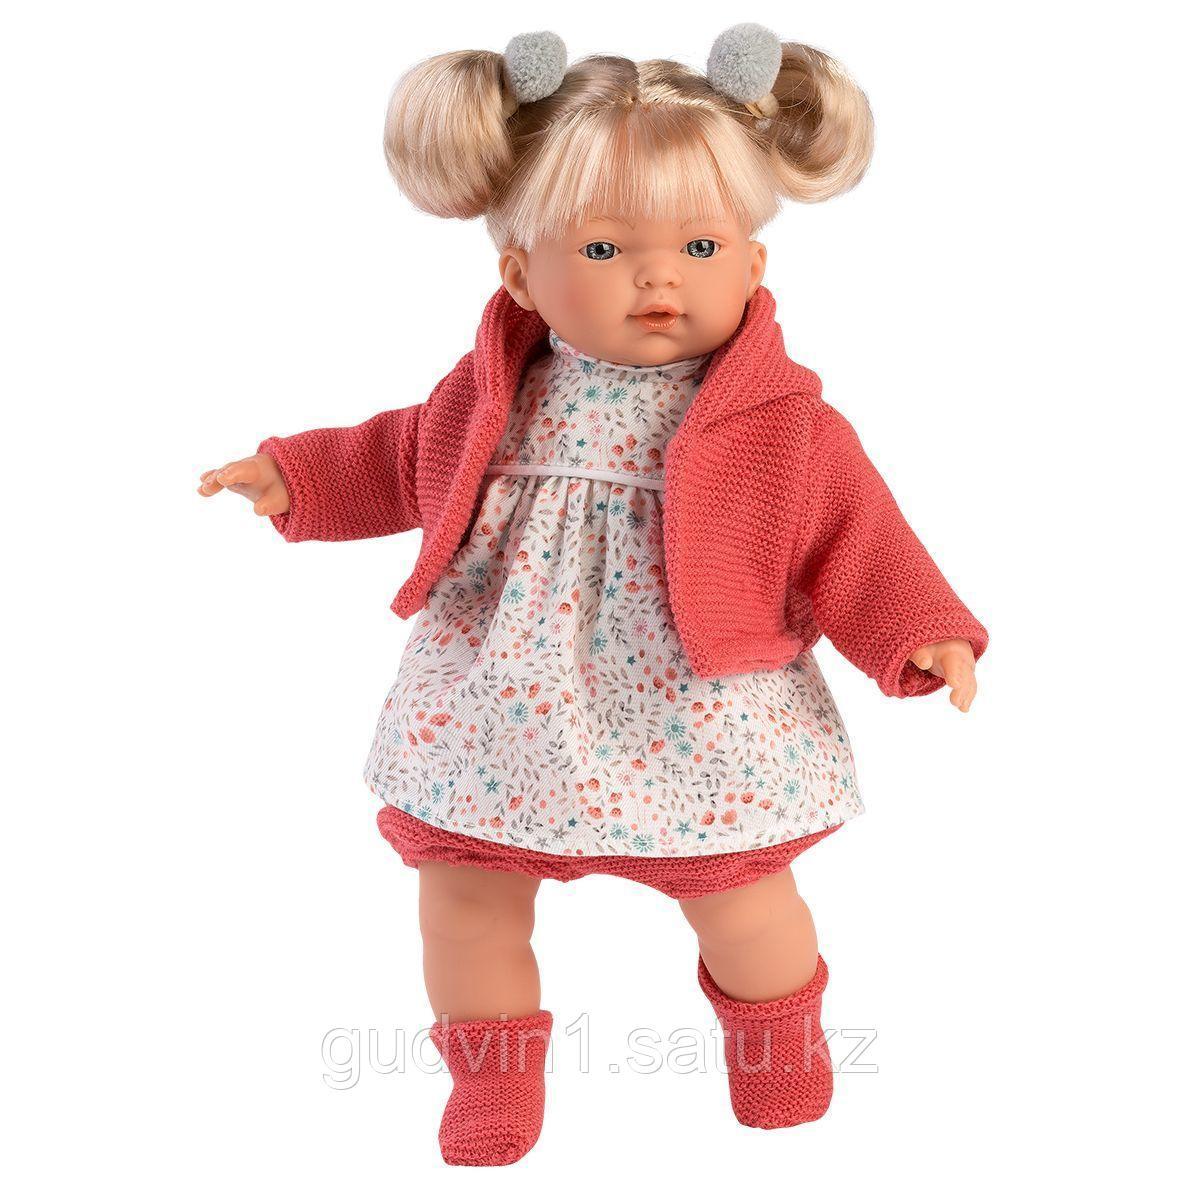 LLORENS: Кукла Аитана 33 см., блондинка в красном жакете 33124